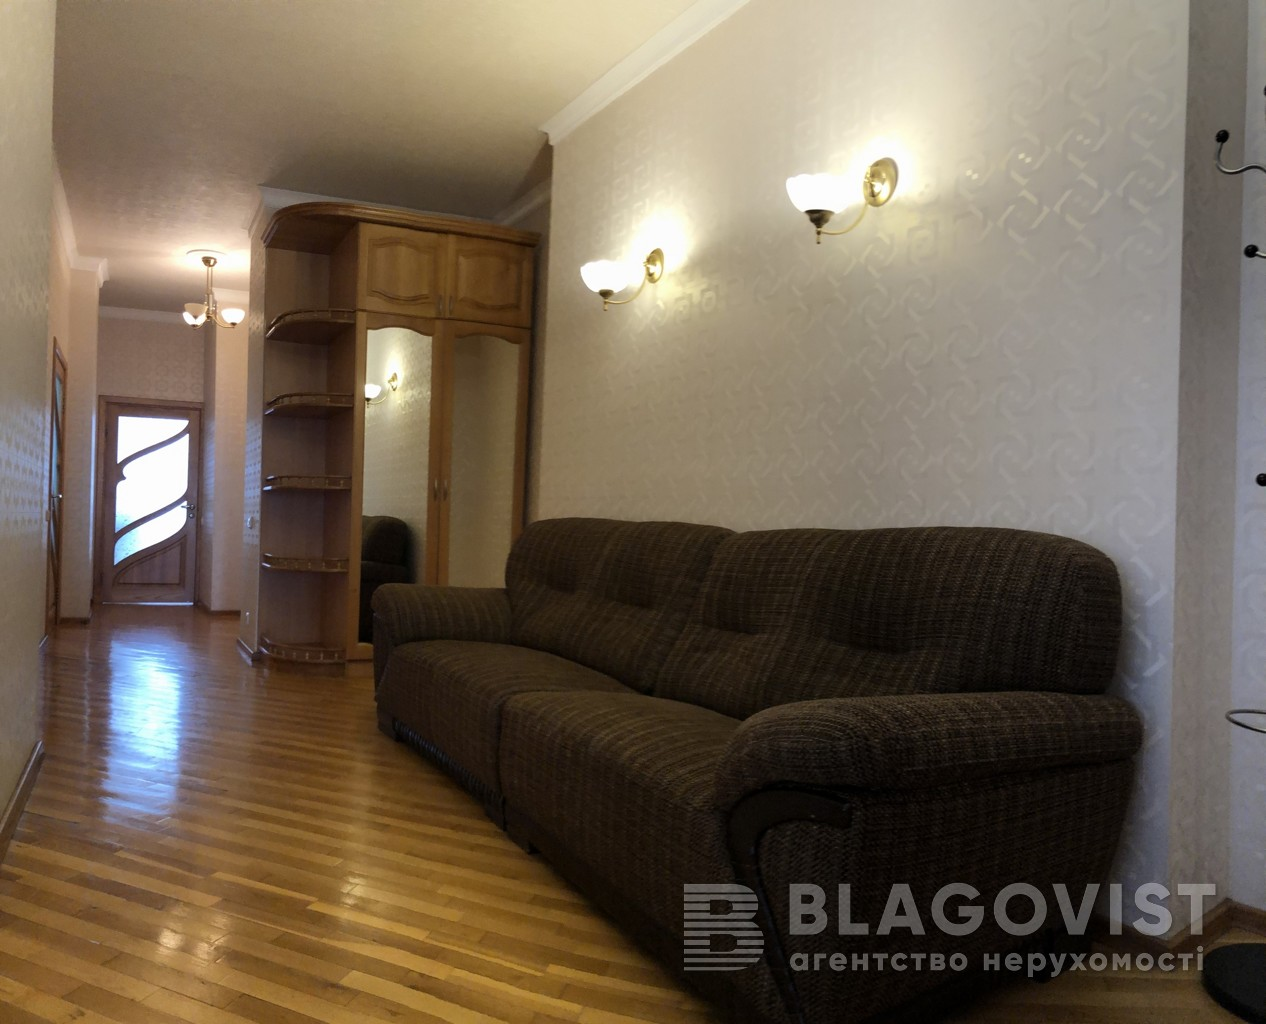 Квартира R-39891, Несторовский пер., 6, Киев - Фото 29